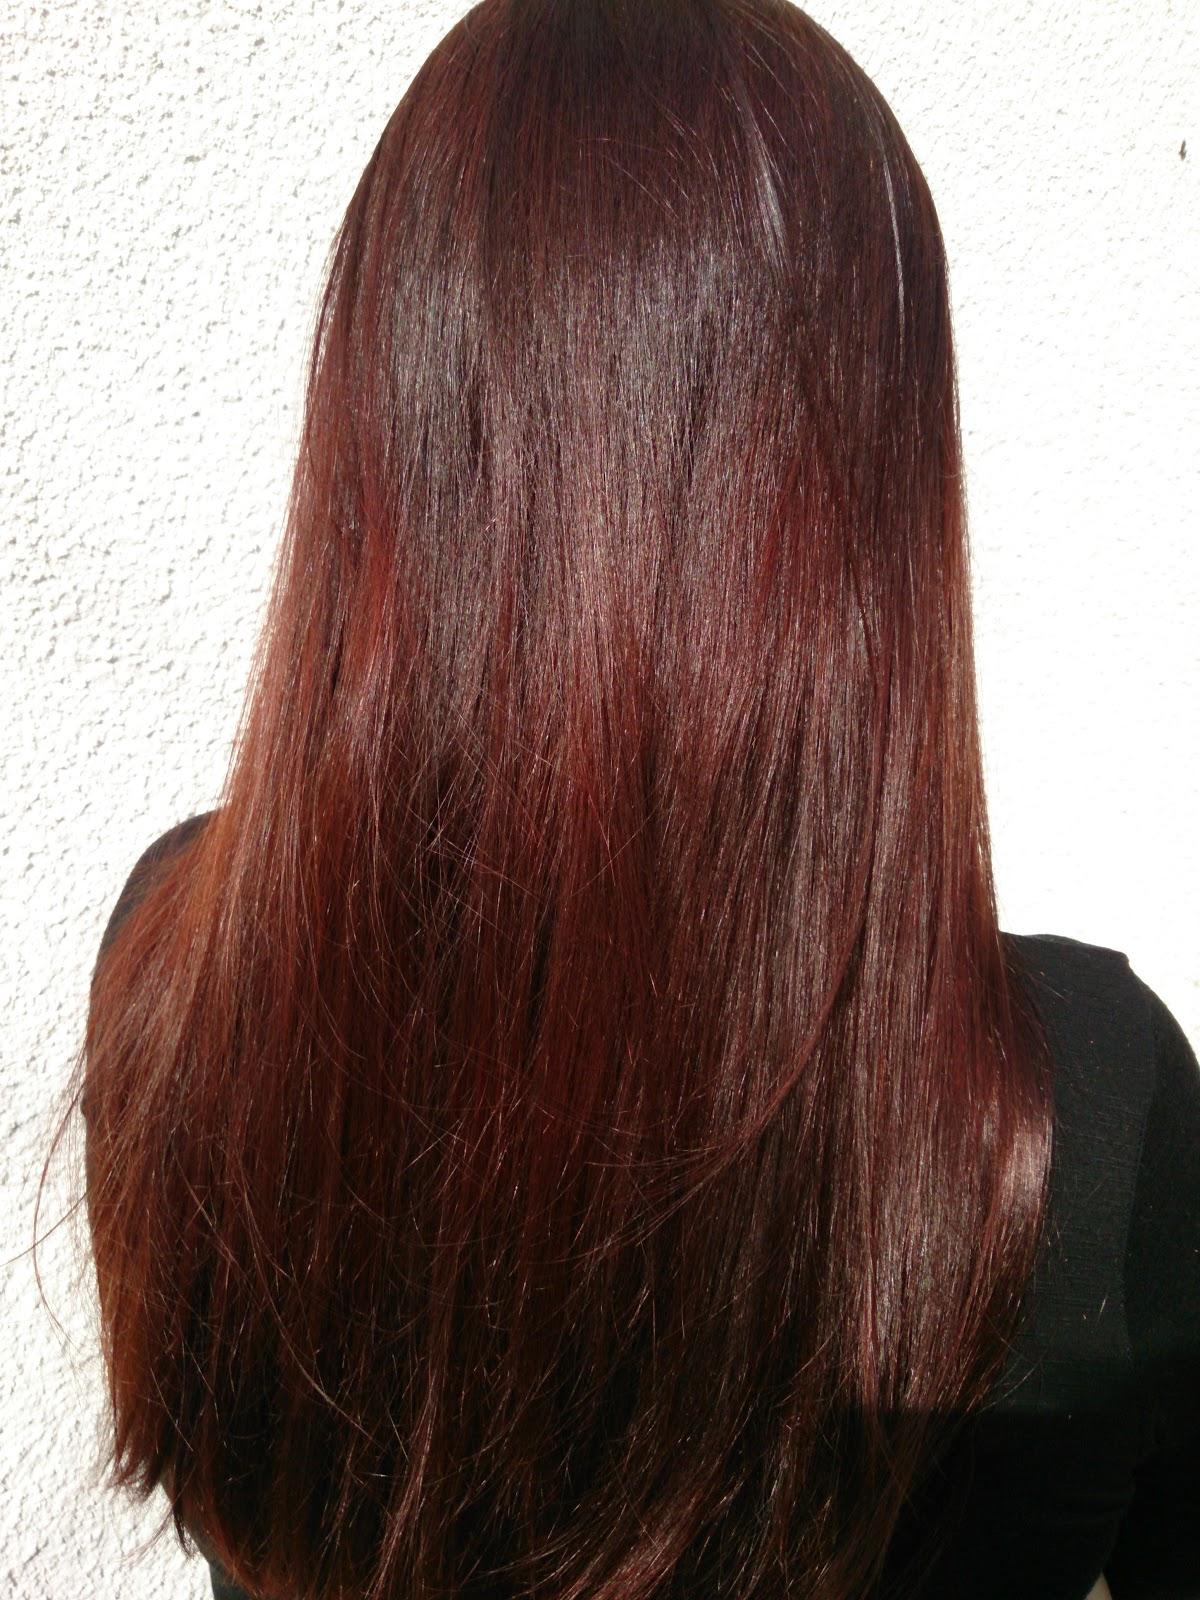 mercredi 13 mars 2013 - Soin Naturel Cheveux Colors